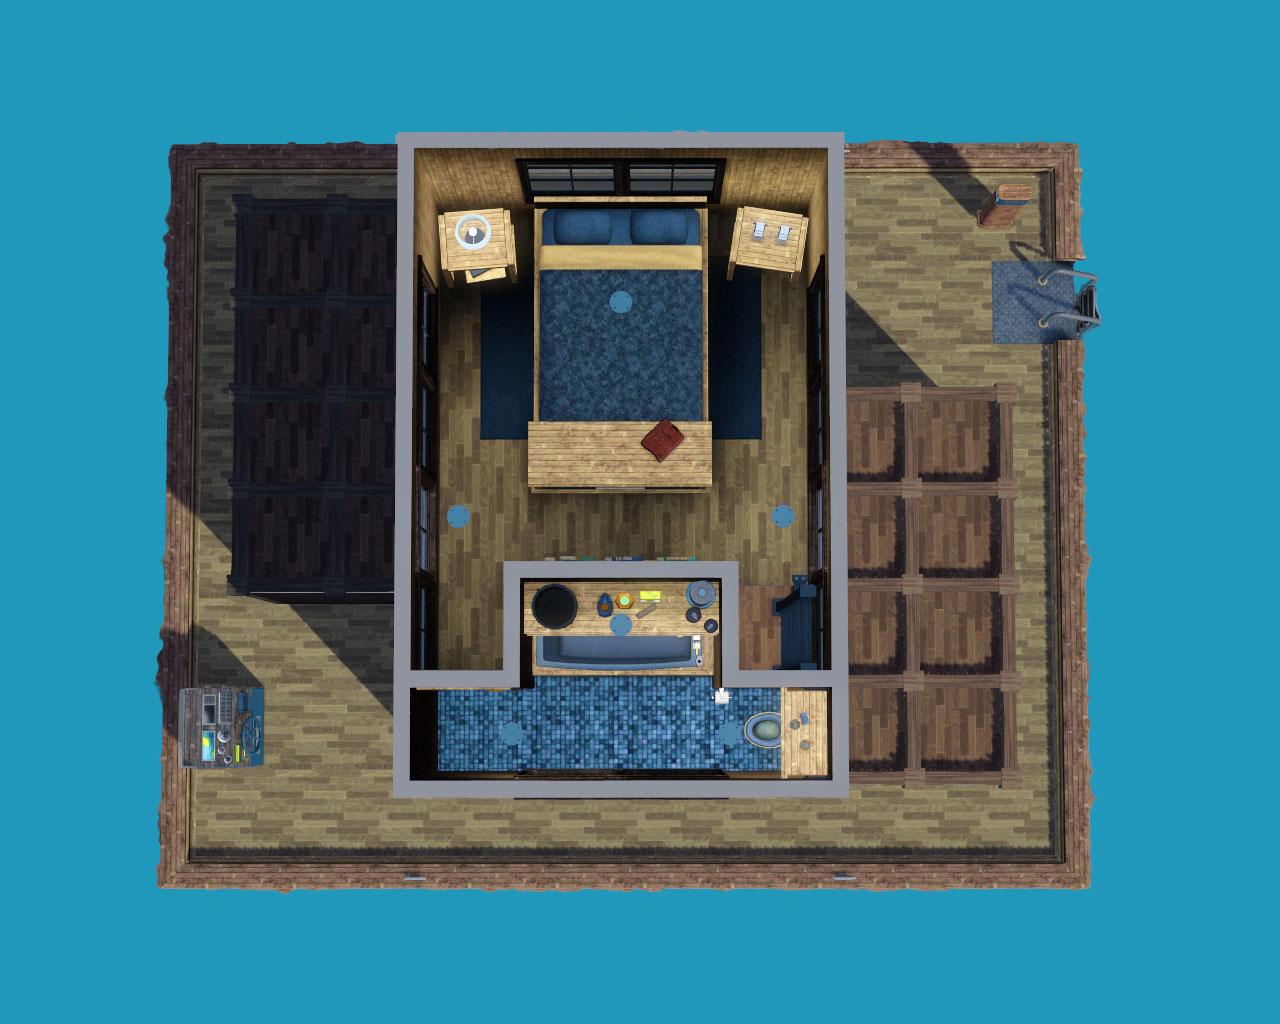 Lapis lazuli house - Advertisement